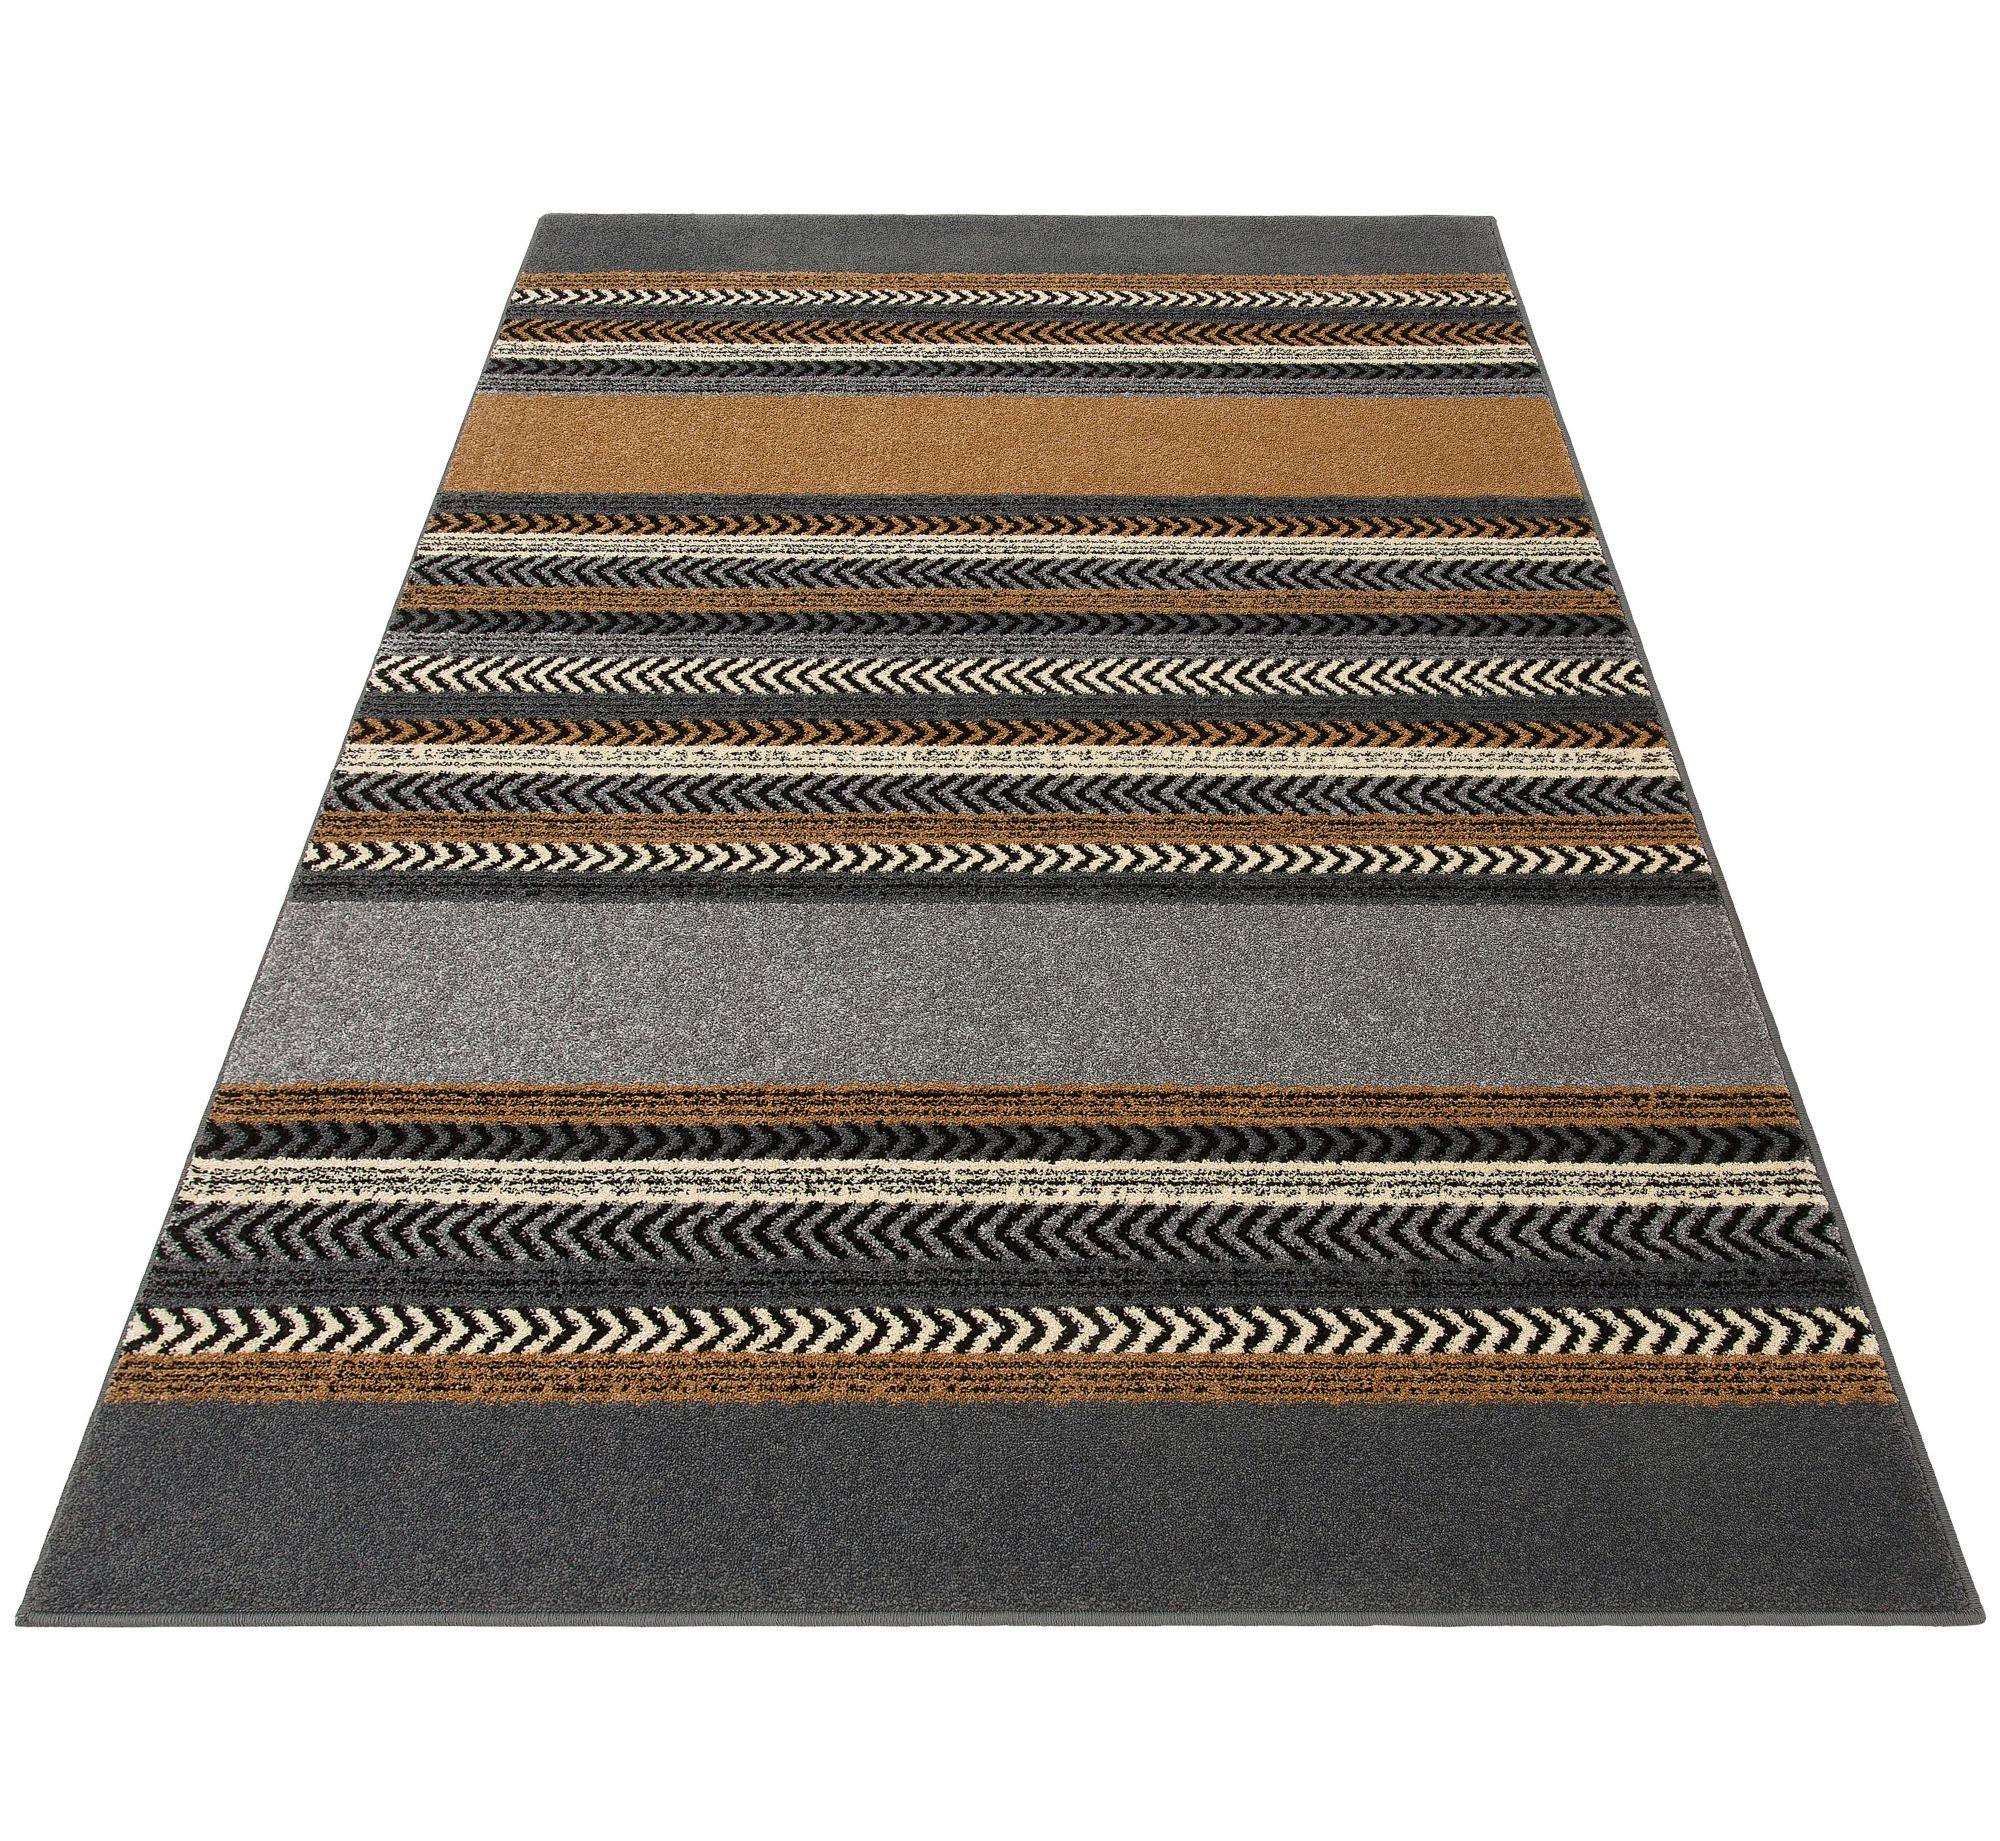 HOME AFFAIRE COLLECTION Teppich, Home affaire Collection, »Keanu«, gewebt